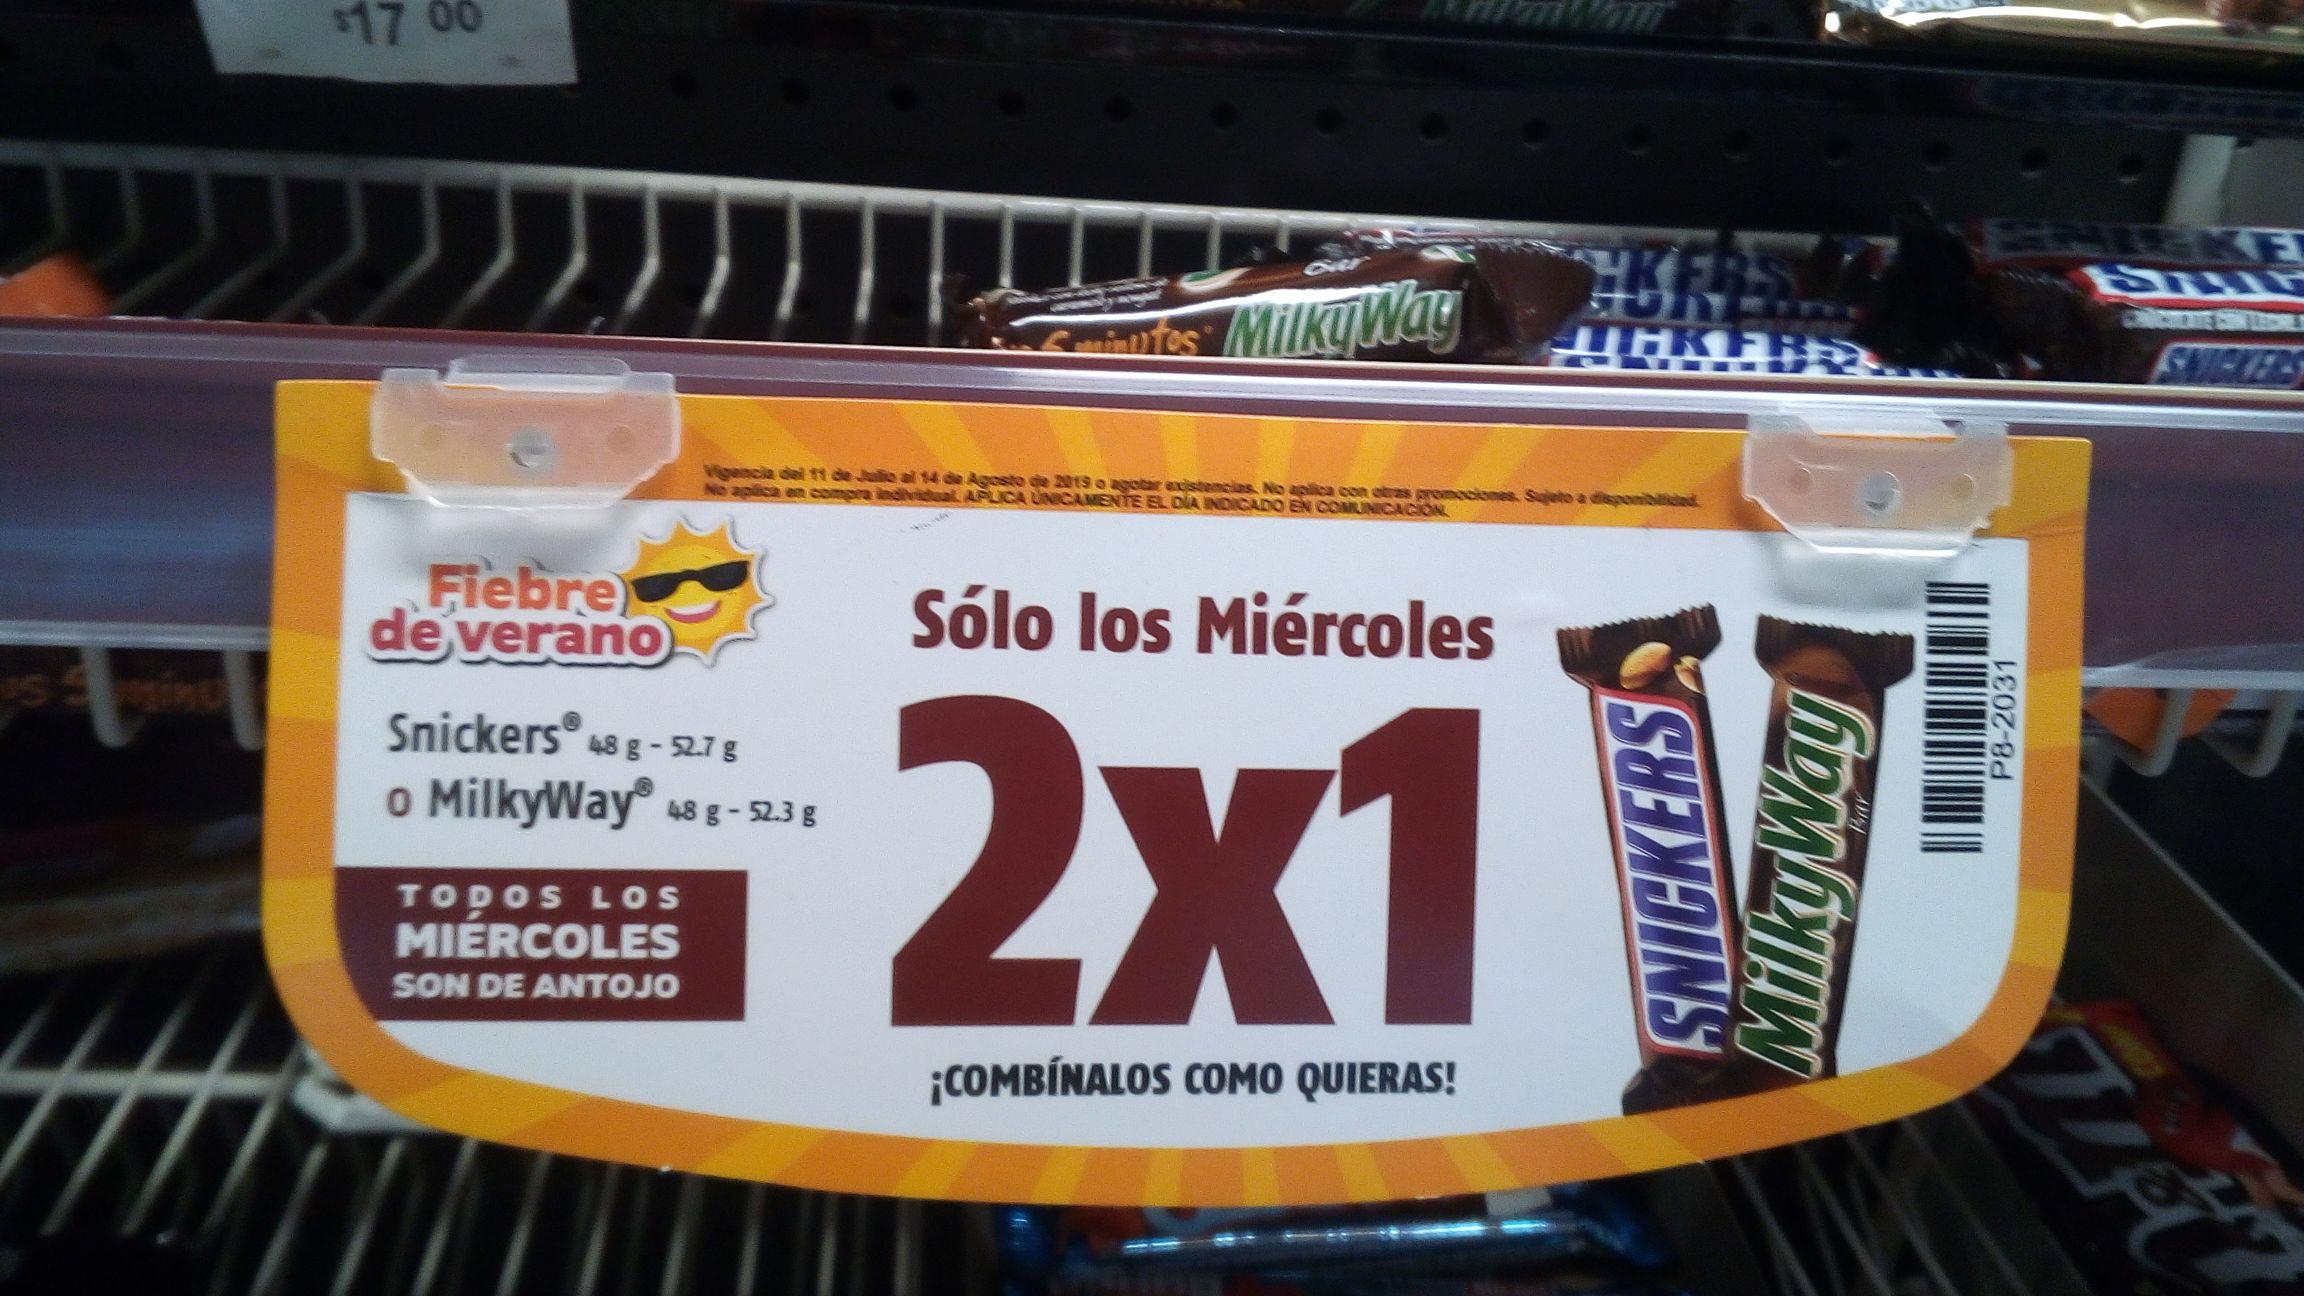 OXXO: 2X1 en Chocolates Snickers o MilkyWay